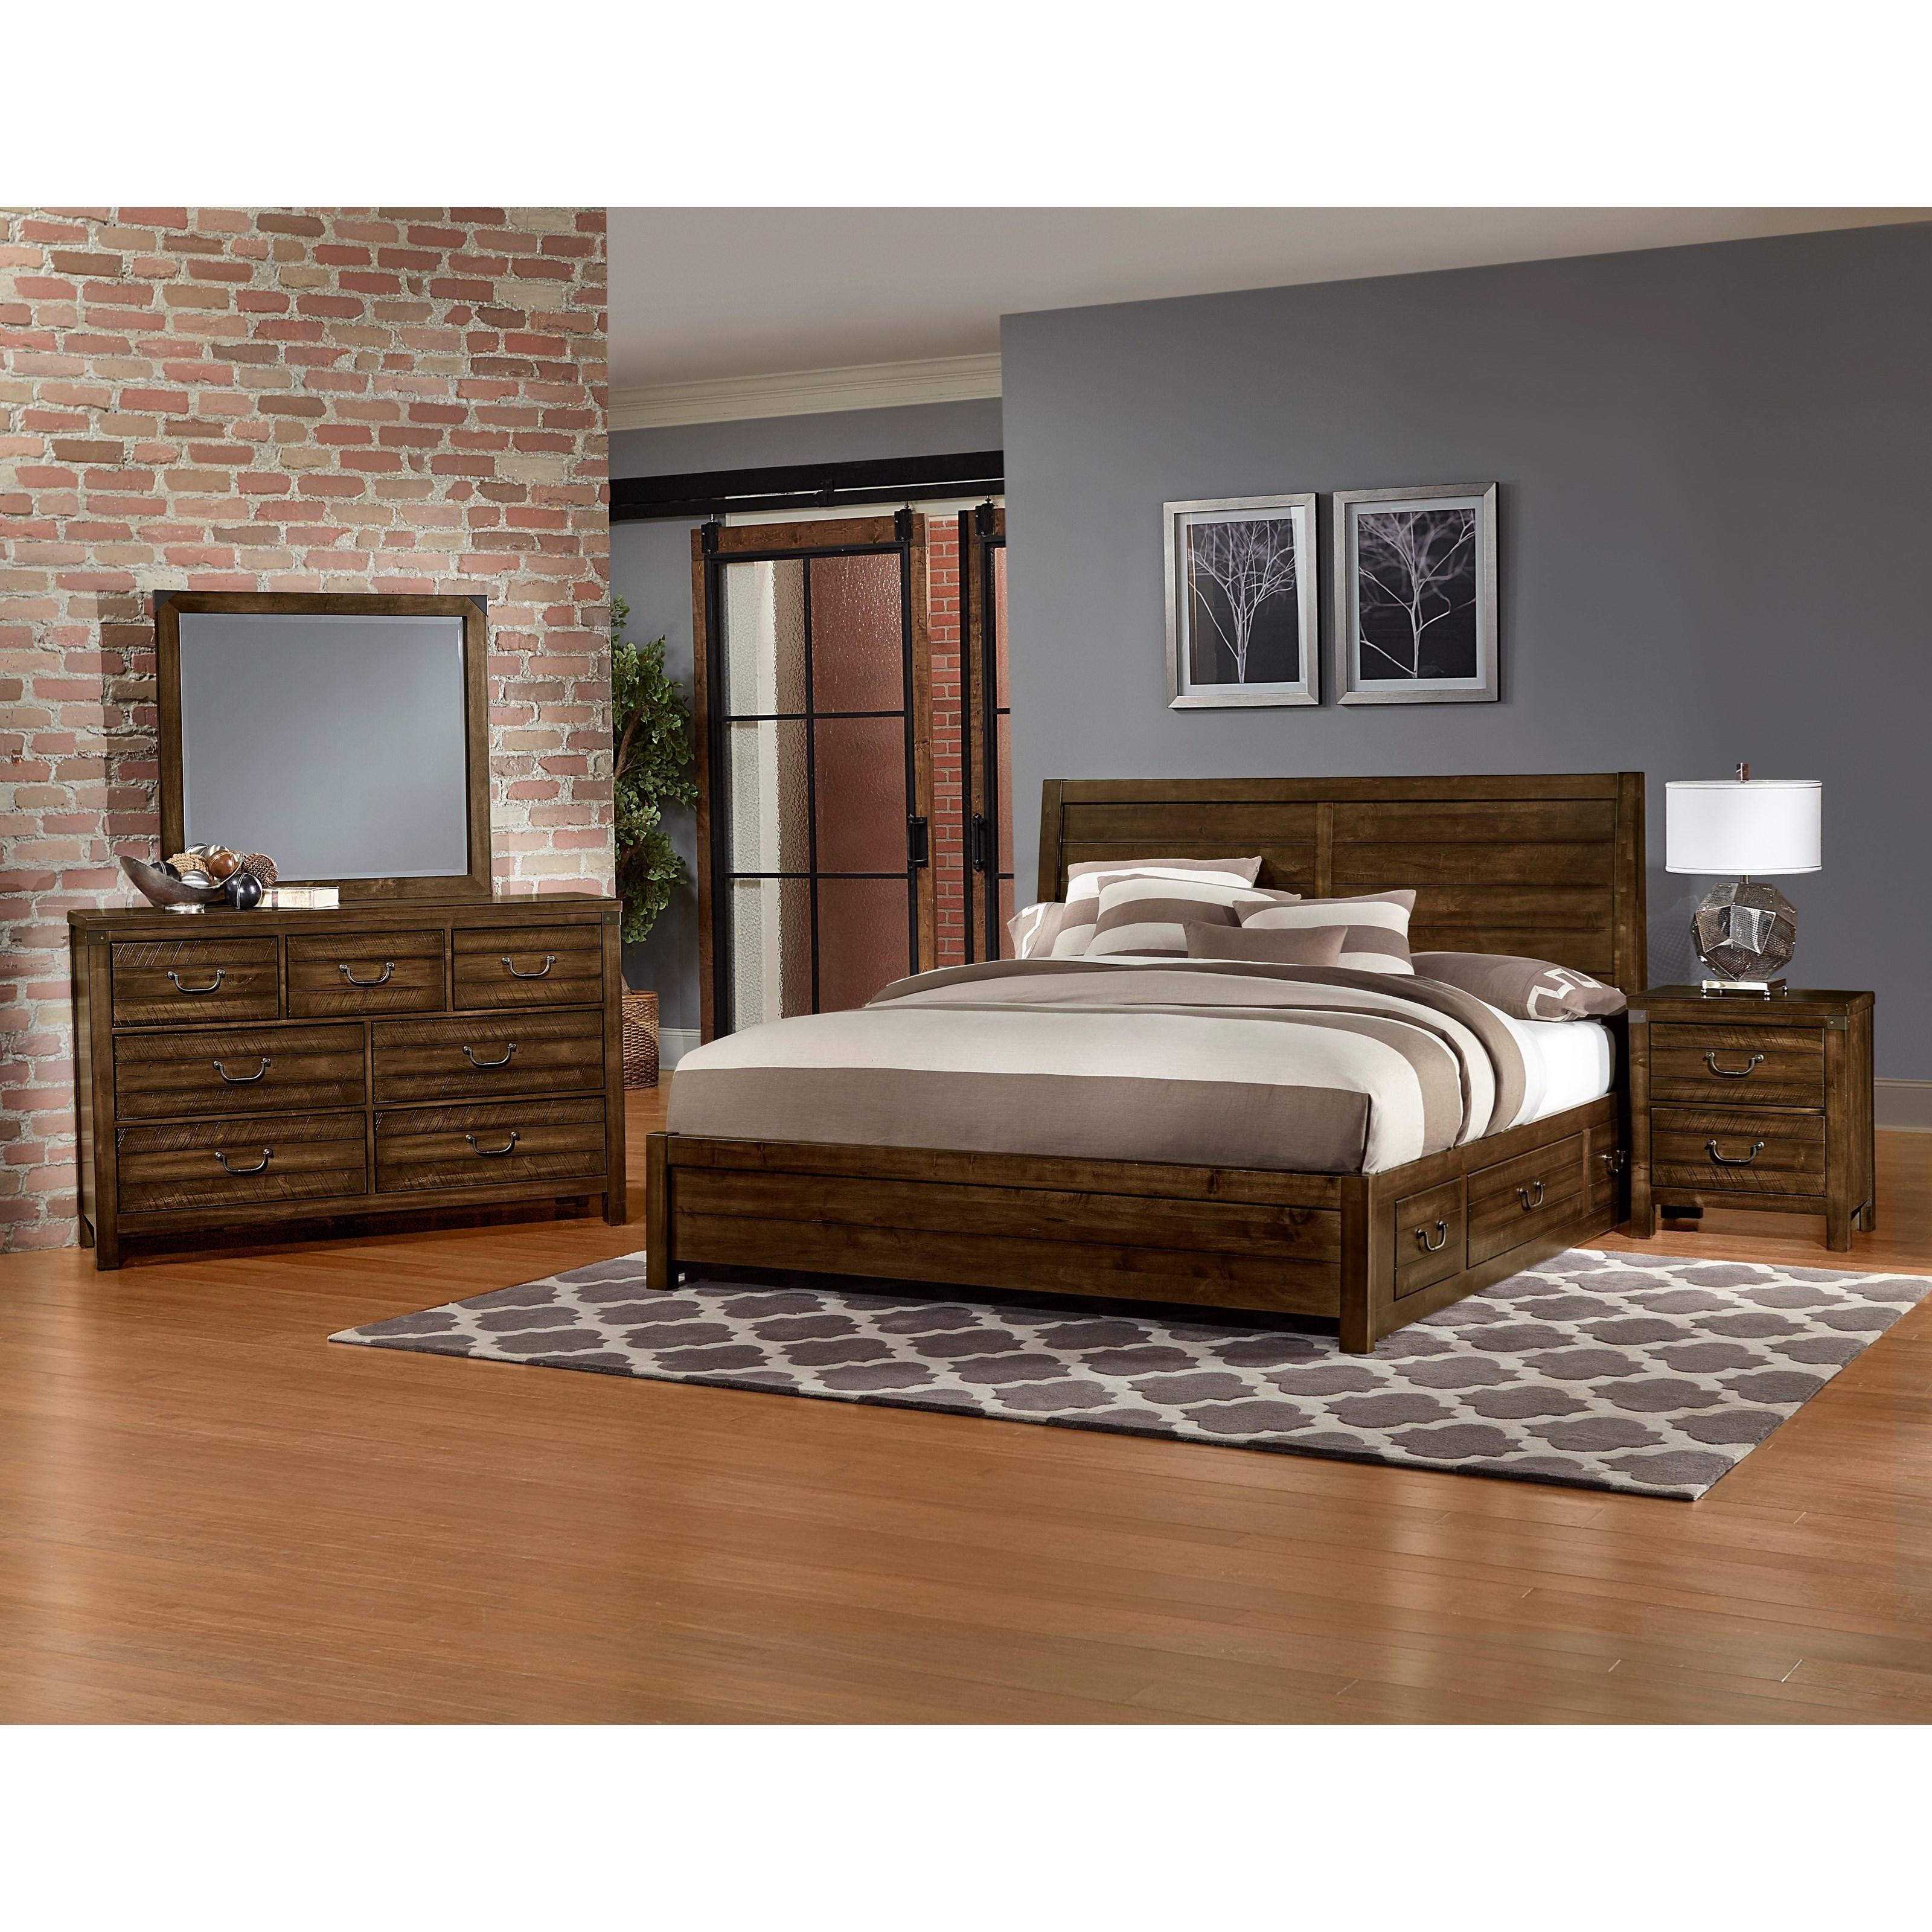 Artisan & Post Sedgwick King Bedroom Group - Item Number: 126 K Bedroom Group 6